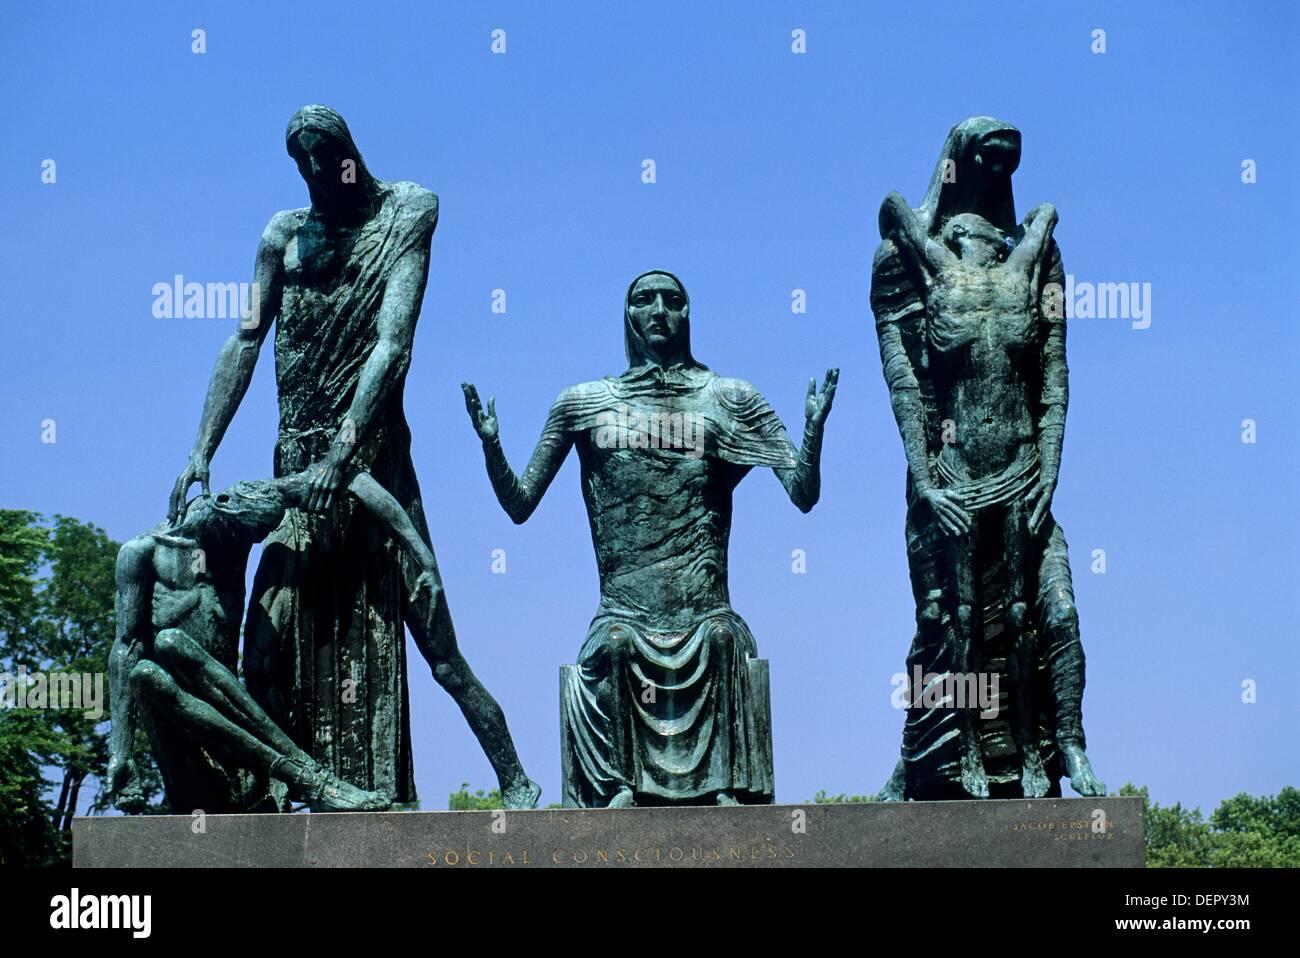 ´social consciousness´ sculpture of Jacob Epstein, Philadelphia Museum of Art, Pennsylvania, United States - Stock Image